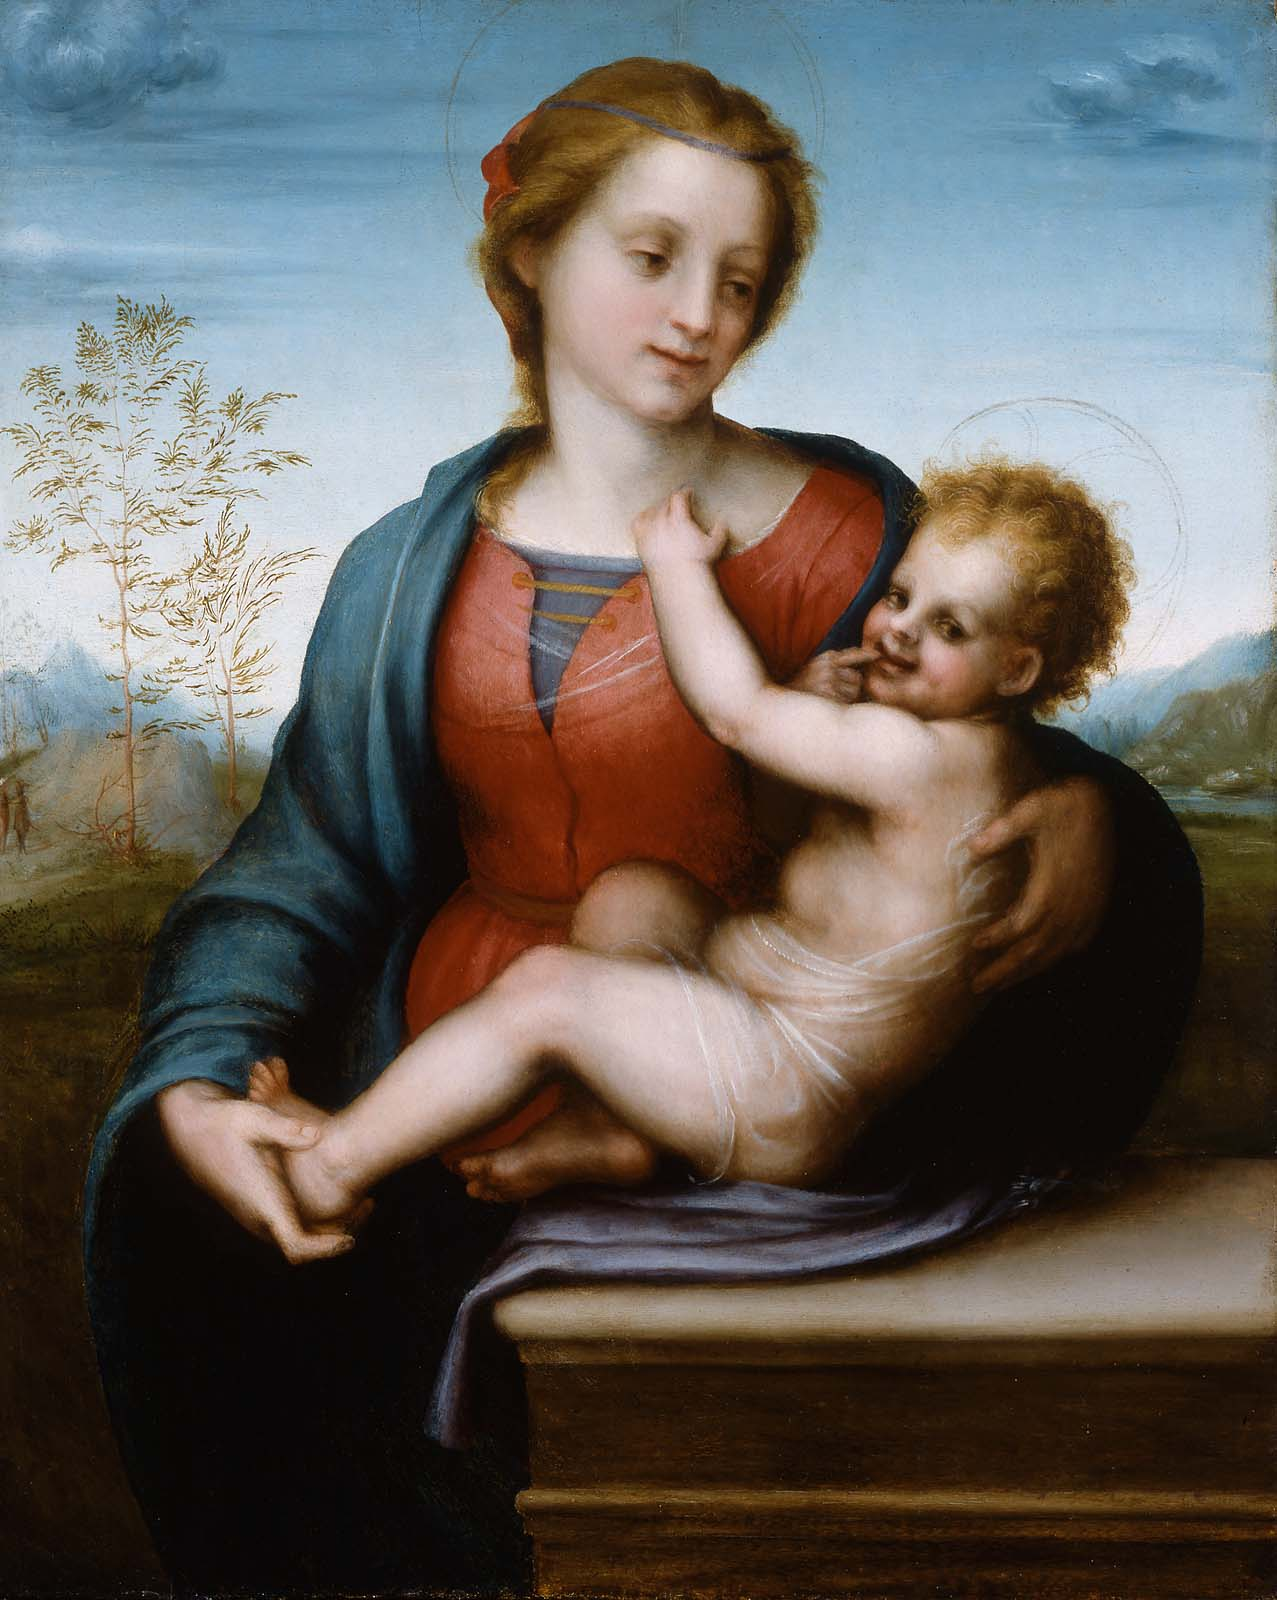 https://4.bp.blogspot.com/-ZFRuNUeagGo/WyaqBxNk9SI/AAAAAAAB9K4/-4GUzcz0pLc1nl05utAN7RNnpwANWl1igCLcBGAs/s1600/Sarto-Andrea-del-Virgin-and-Child-c1509-1510-oil-on-panel-Museum-of-Fine-Arts-Boston.jpg